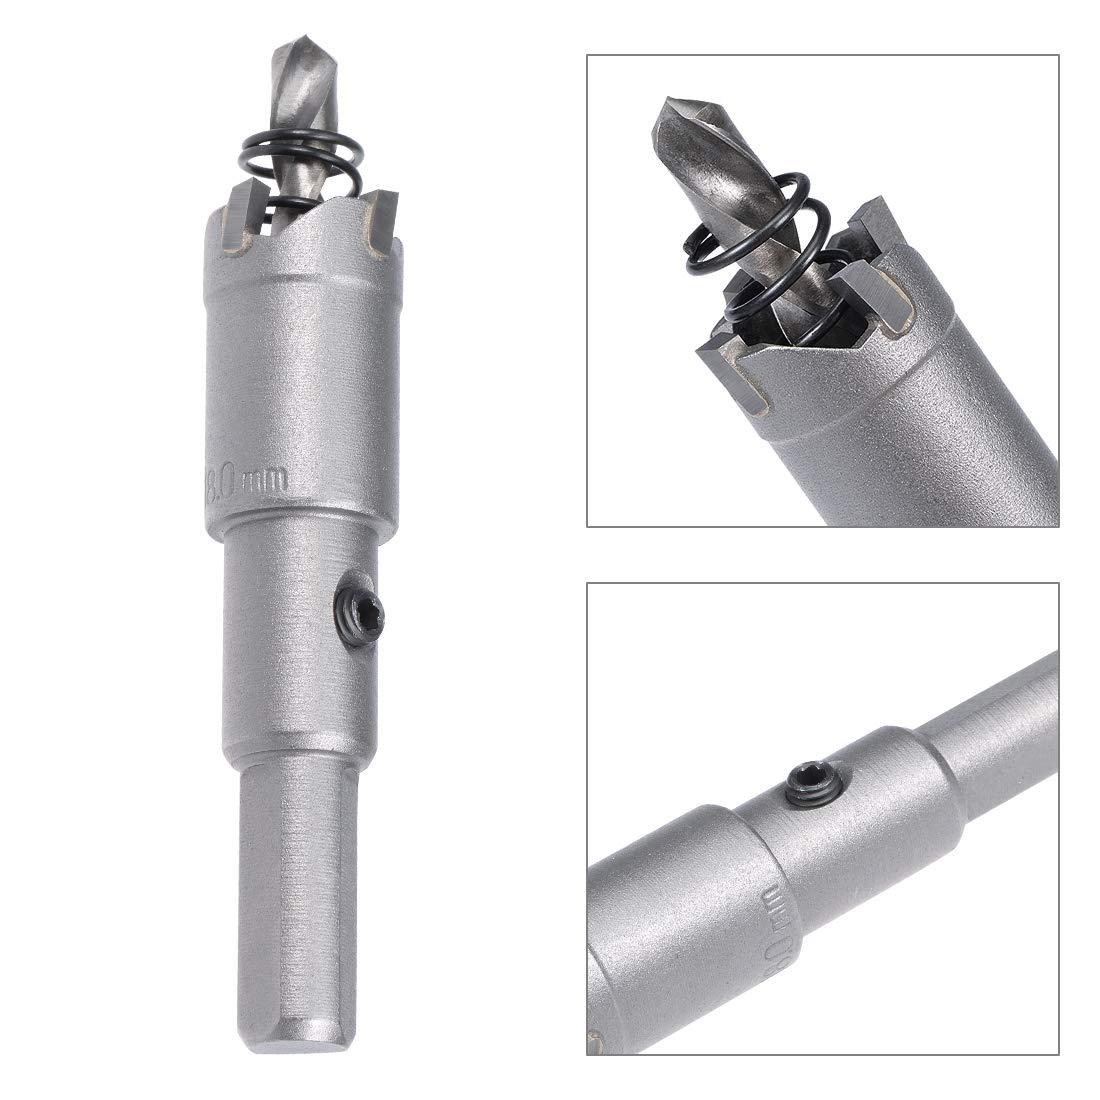 Broca para sierra perforadora Sourcingmap acero inoxidable, 18 mm